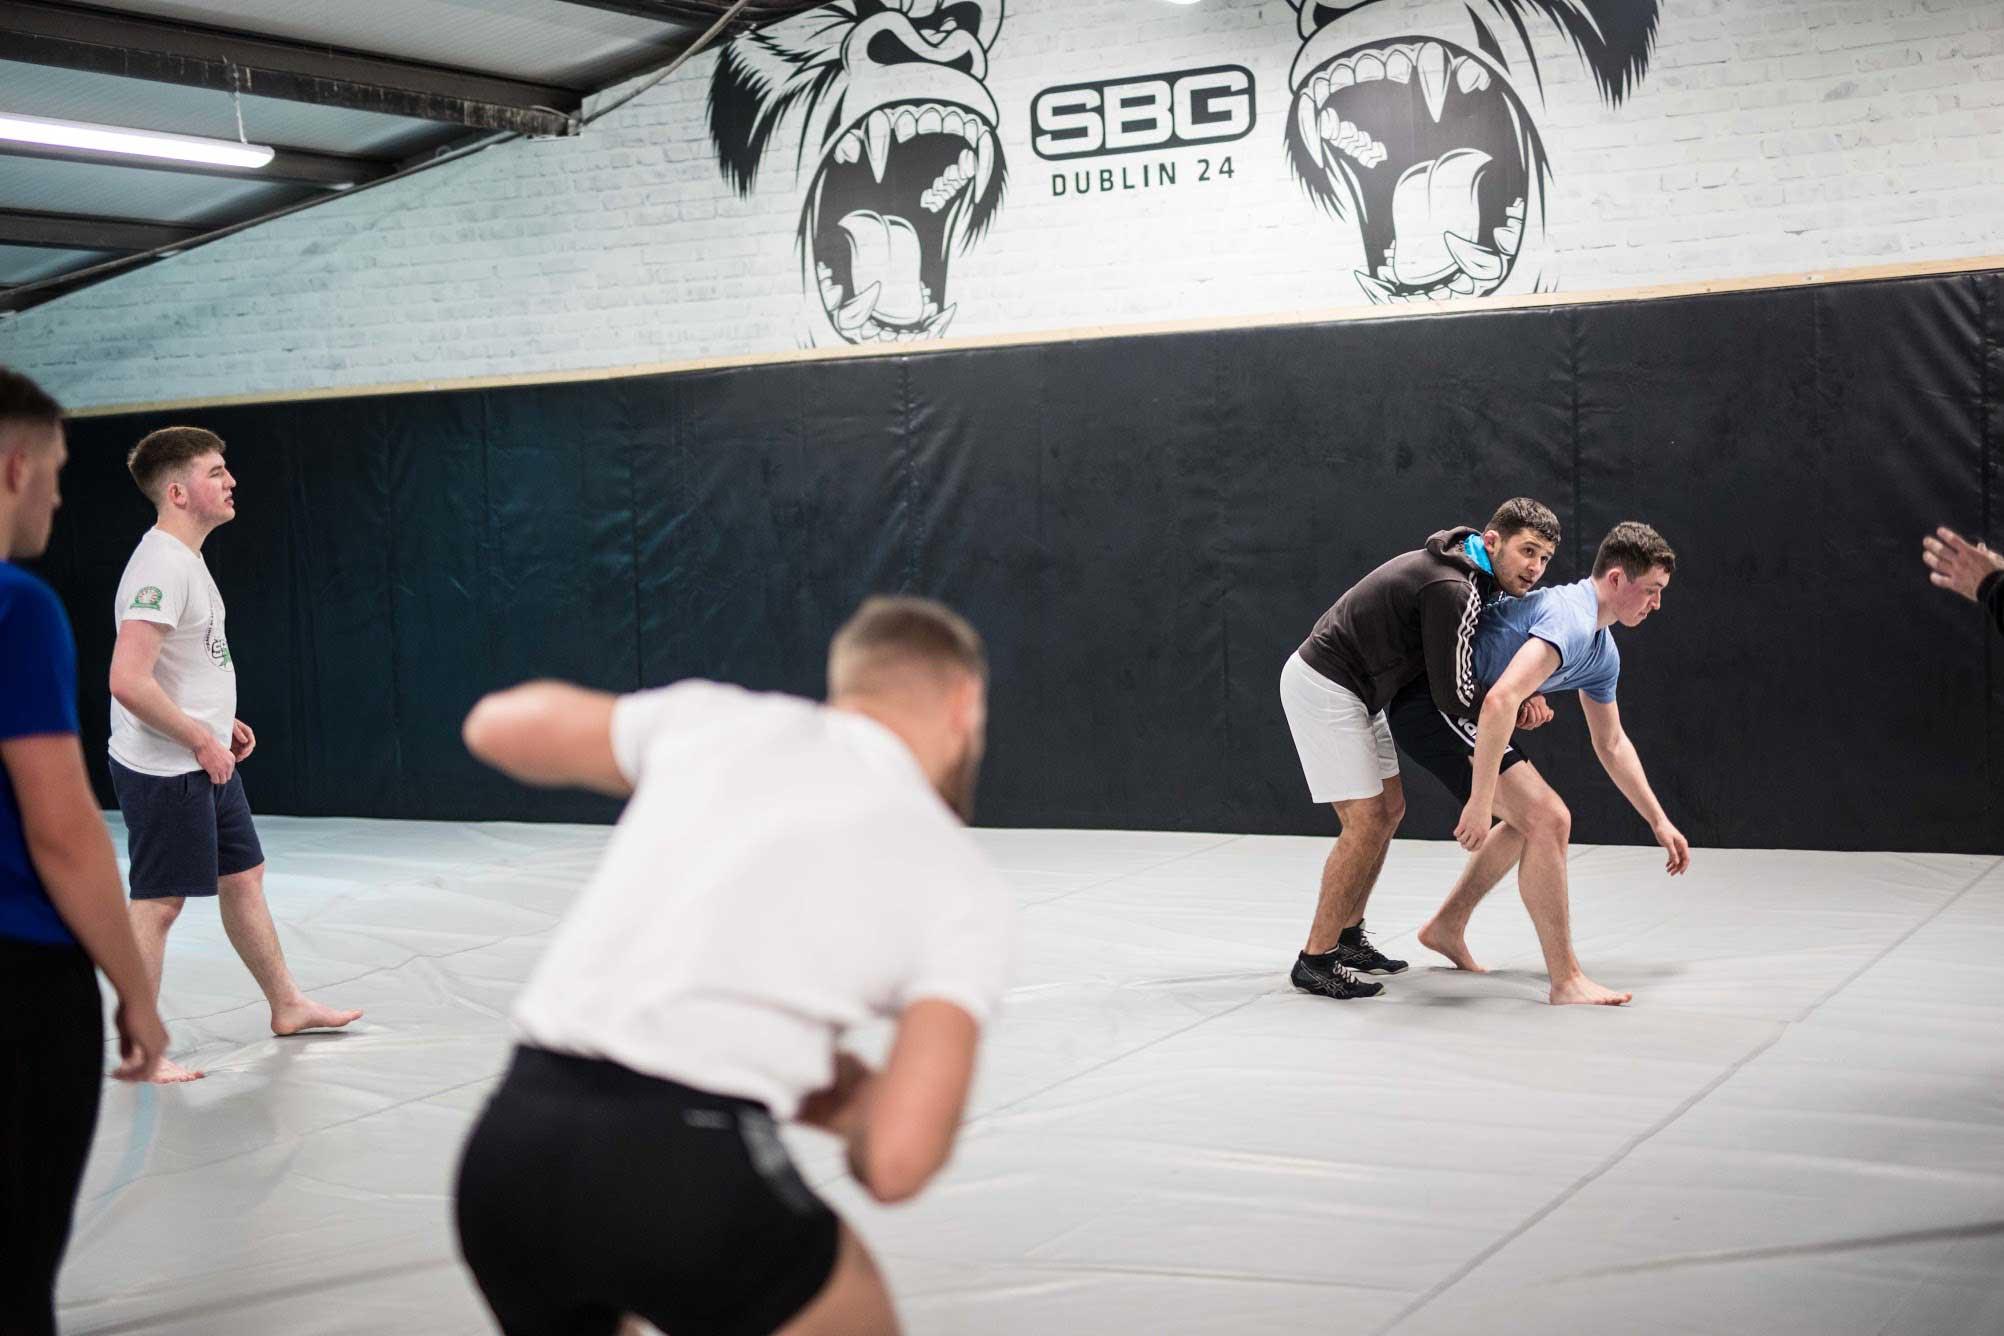 Conor McGregor training wrestling at SBG Dublin24